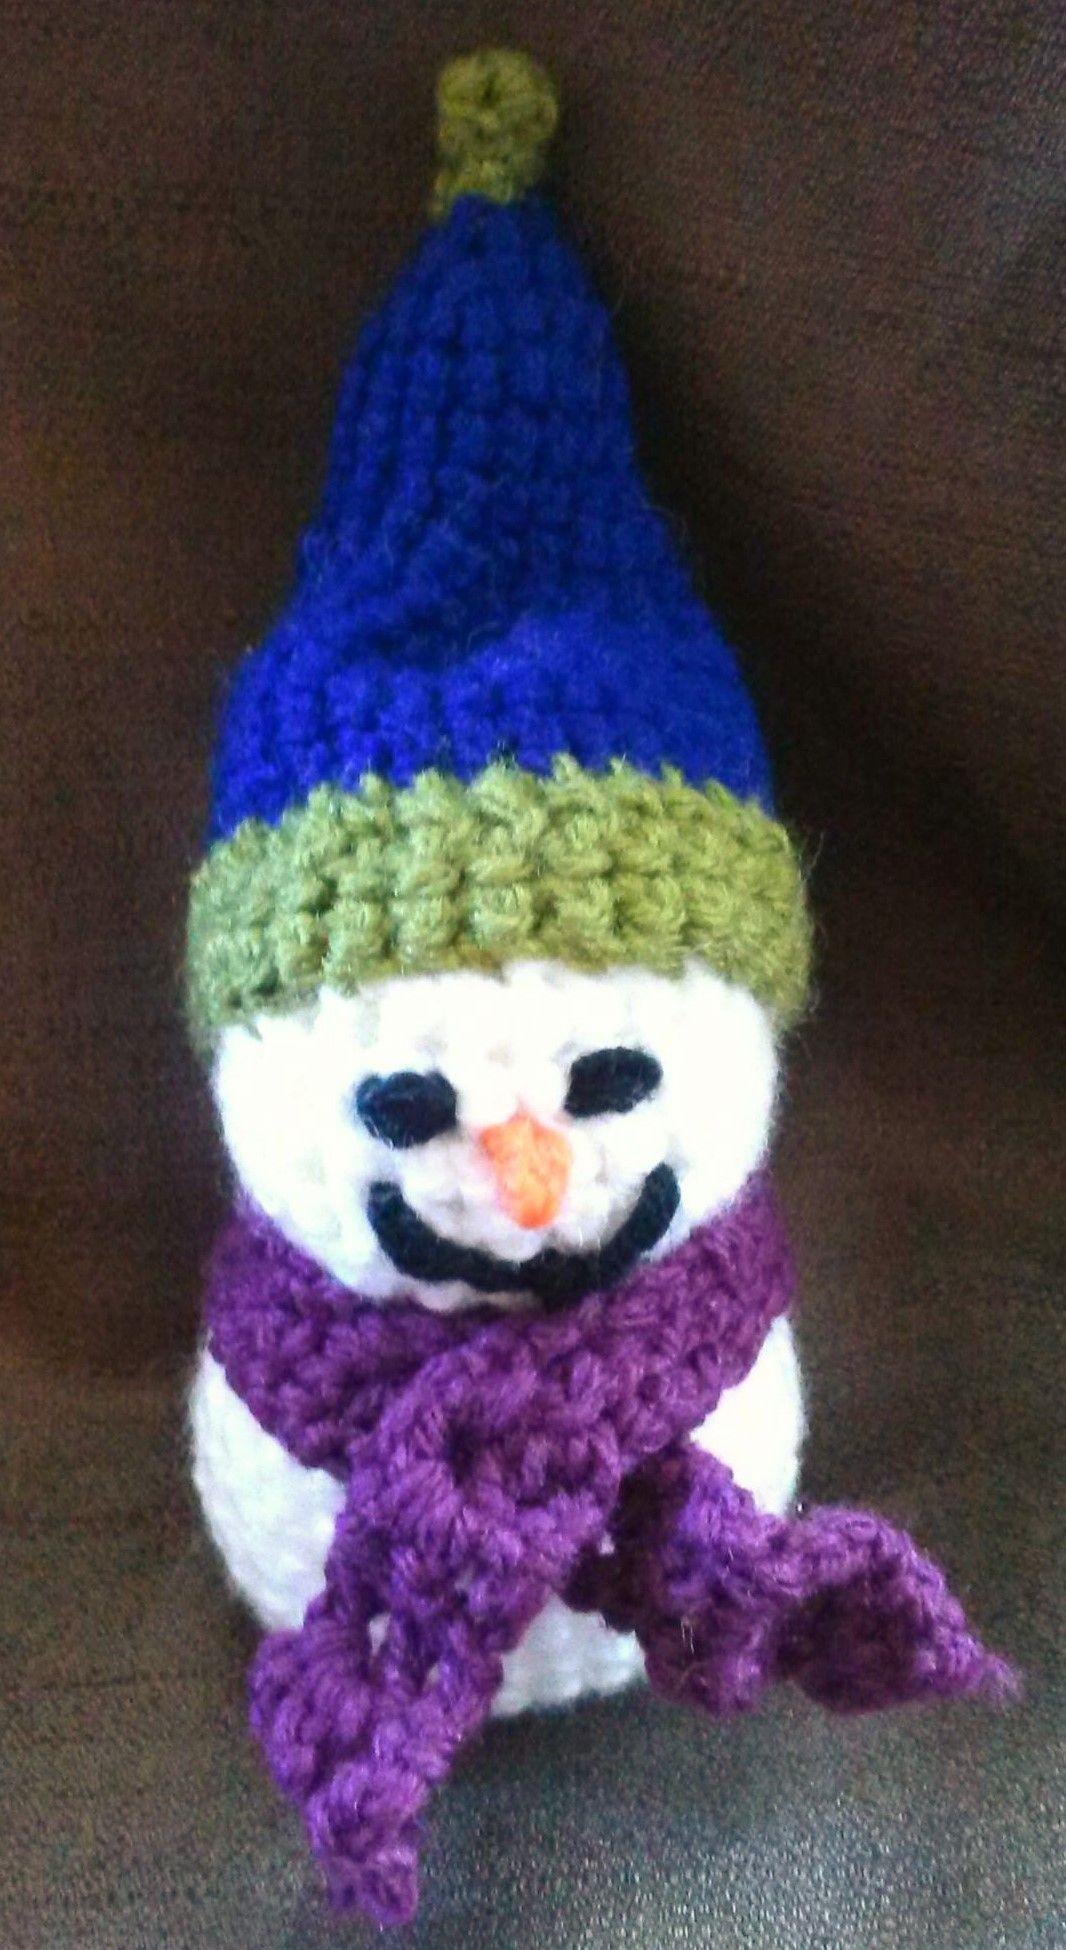 boneco de neve em crochê amigurumi.